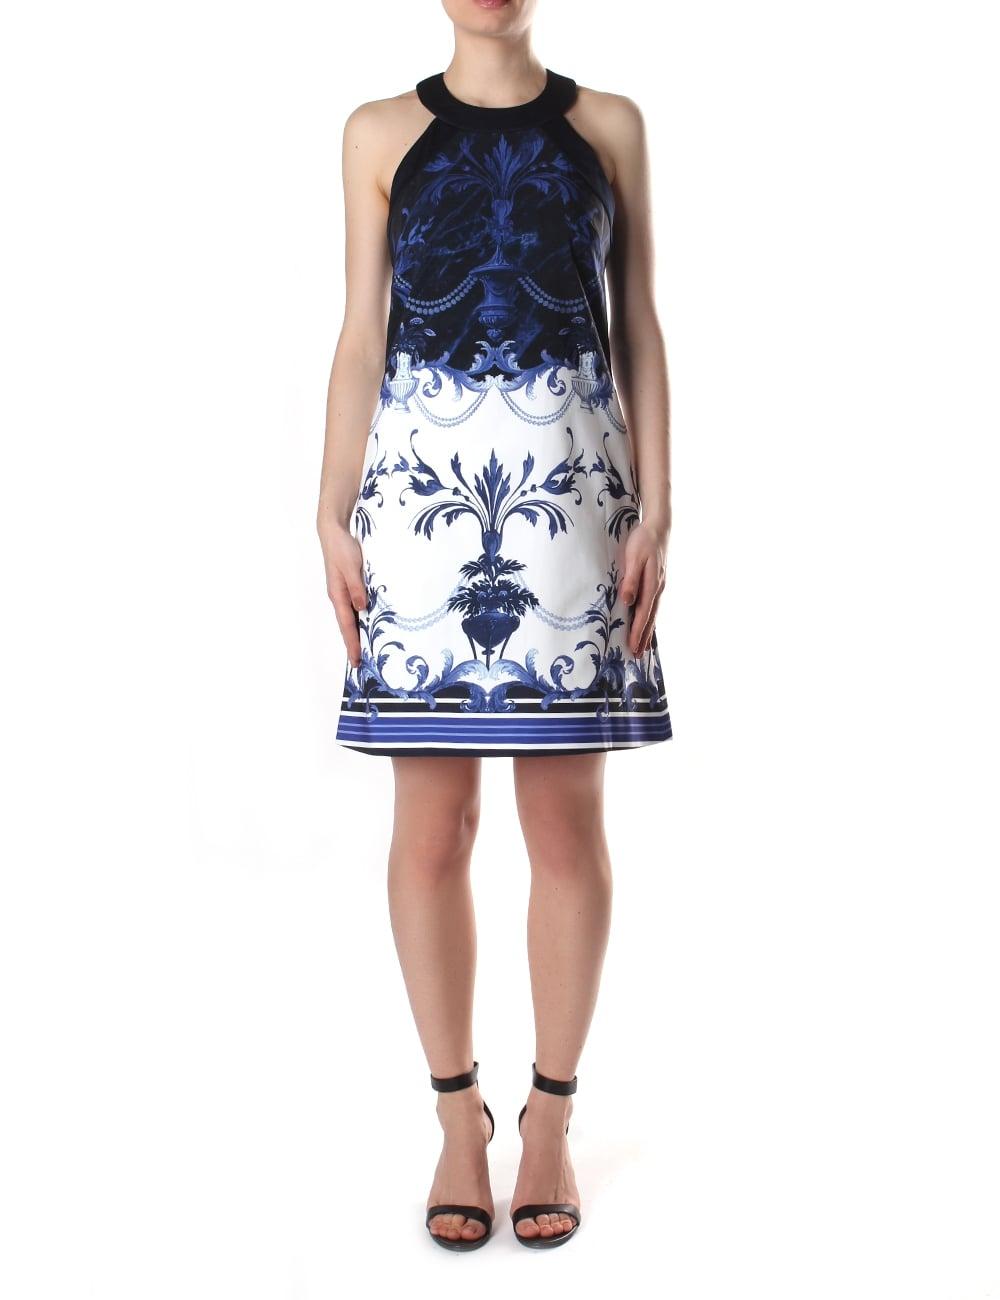 5b71378888c4 Ted Baker Women s Molliat Persian Blue Halterneck Tunic